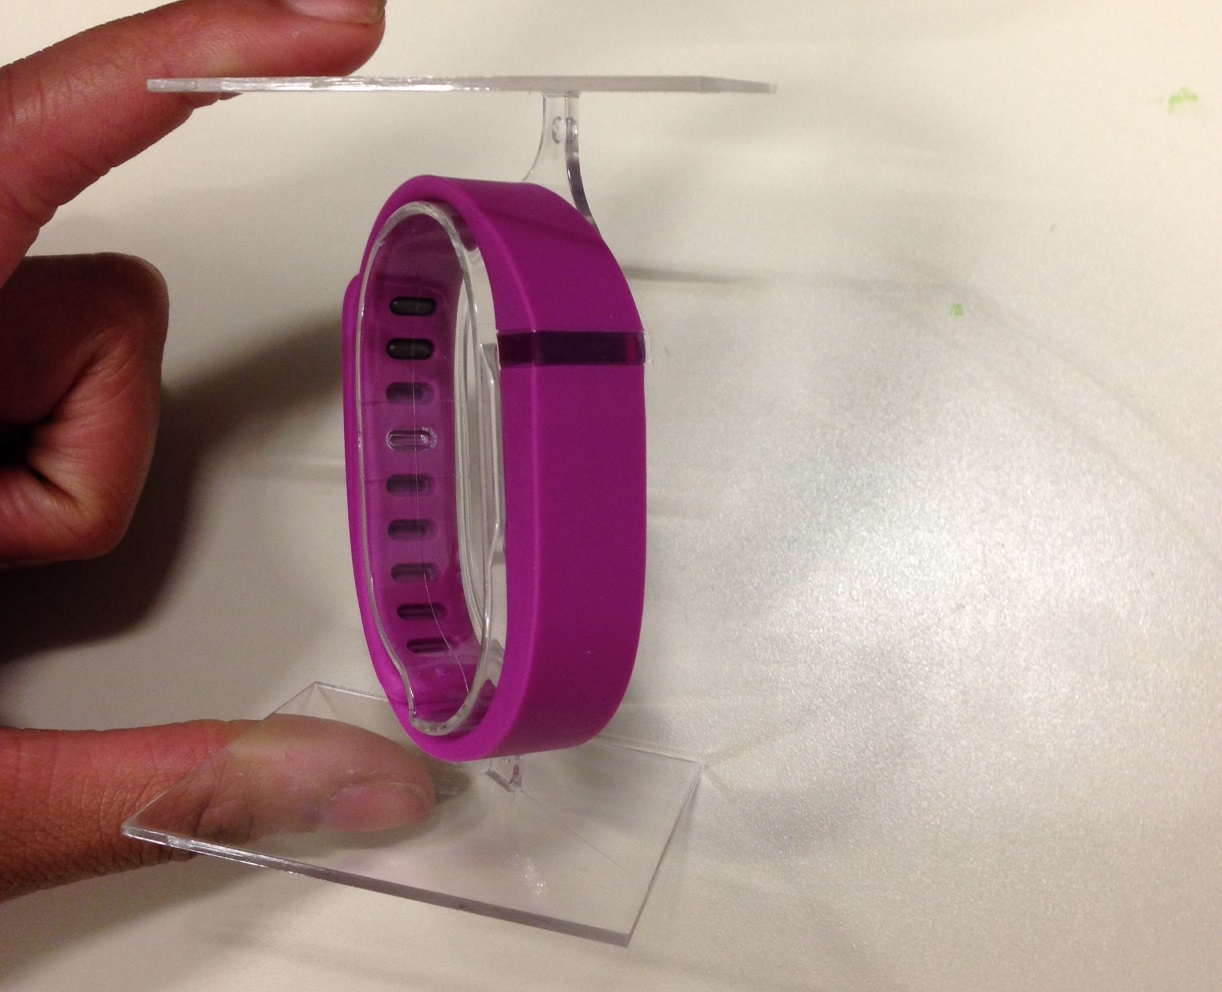 Fitbit Flex Wireless Activity And Sleep Tracker Wristband Review Cruz 1